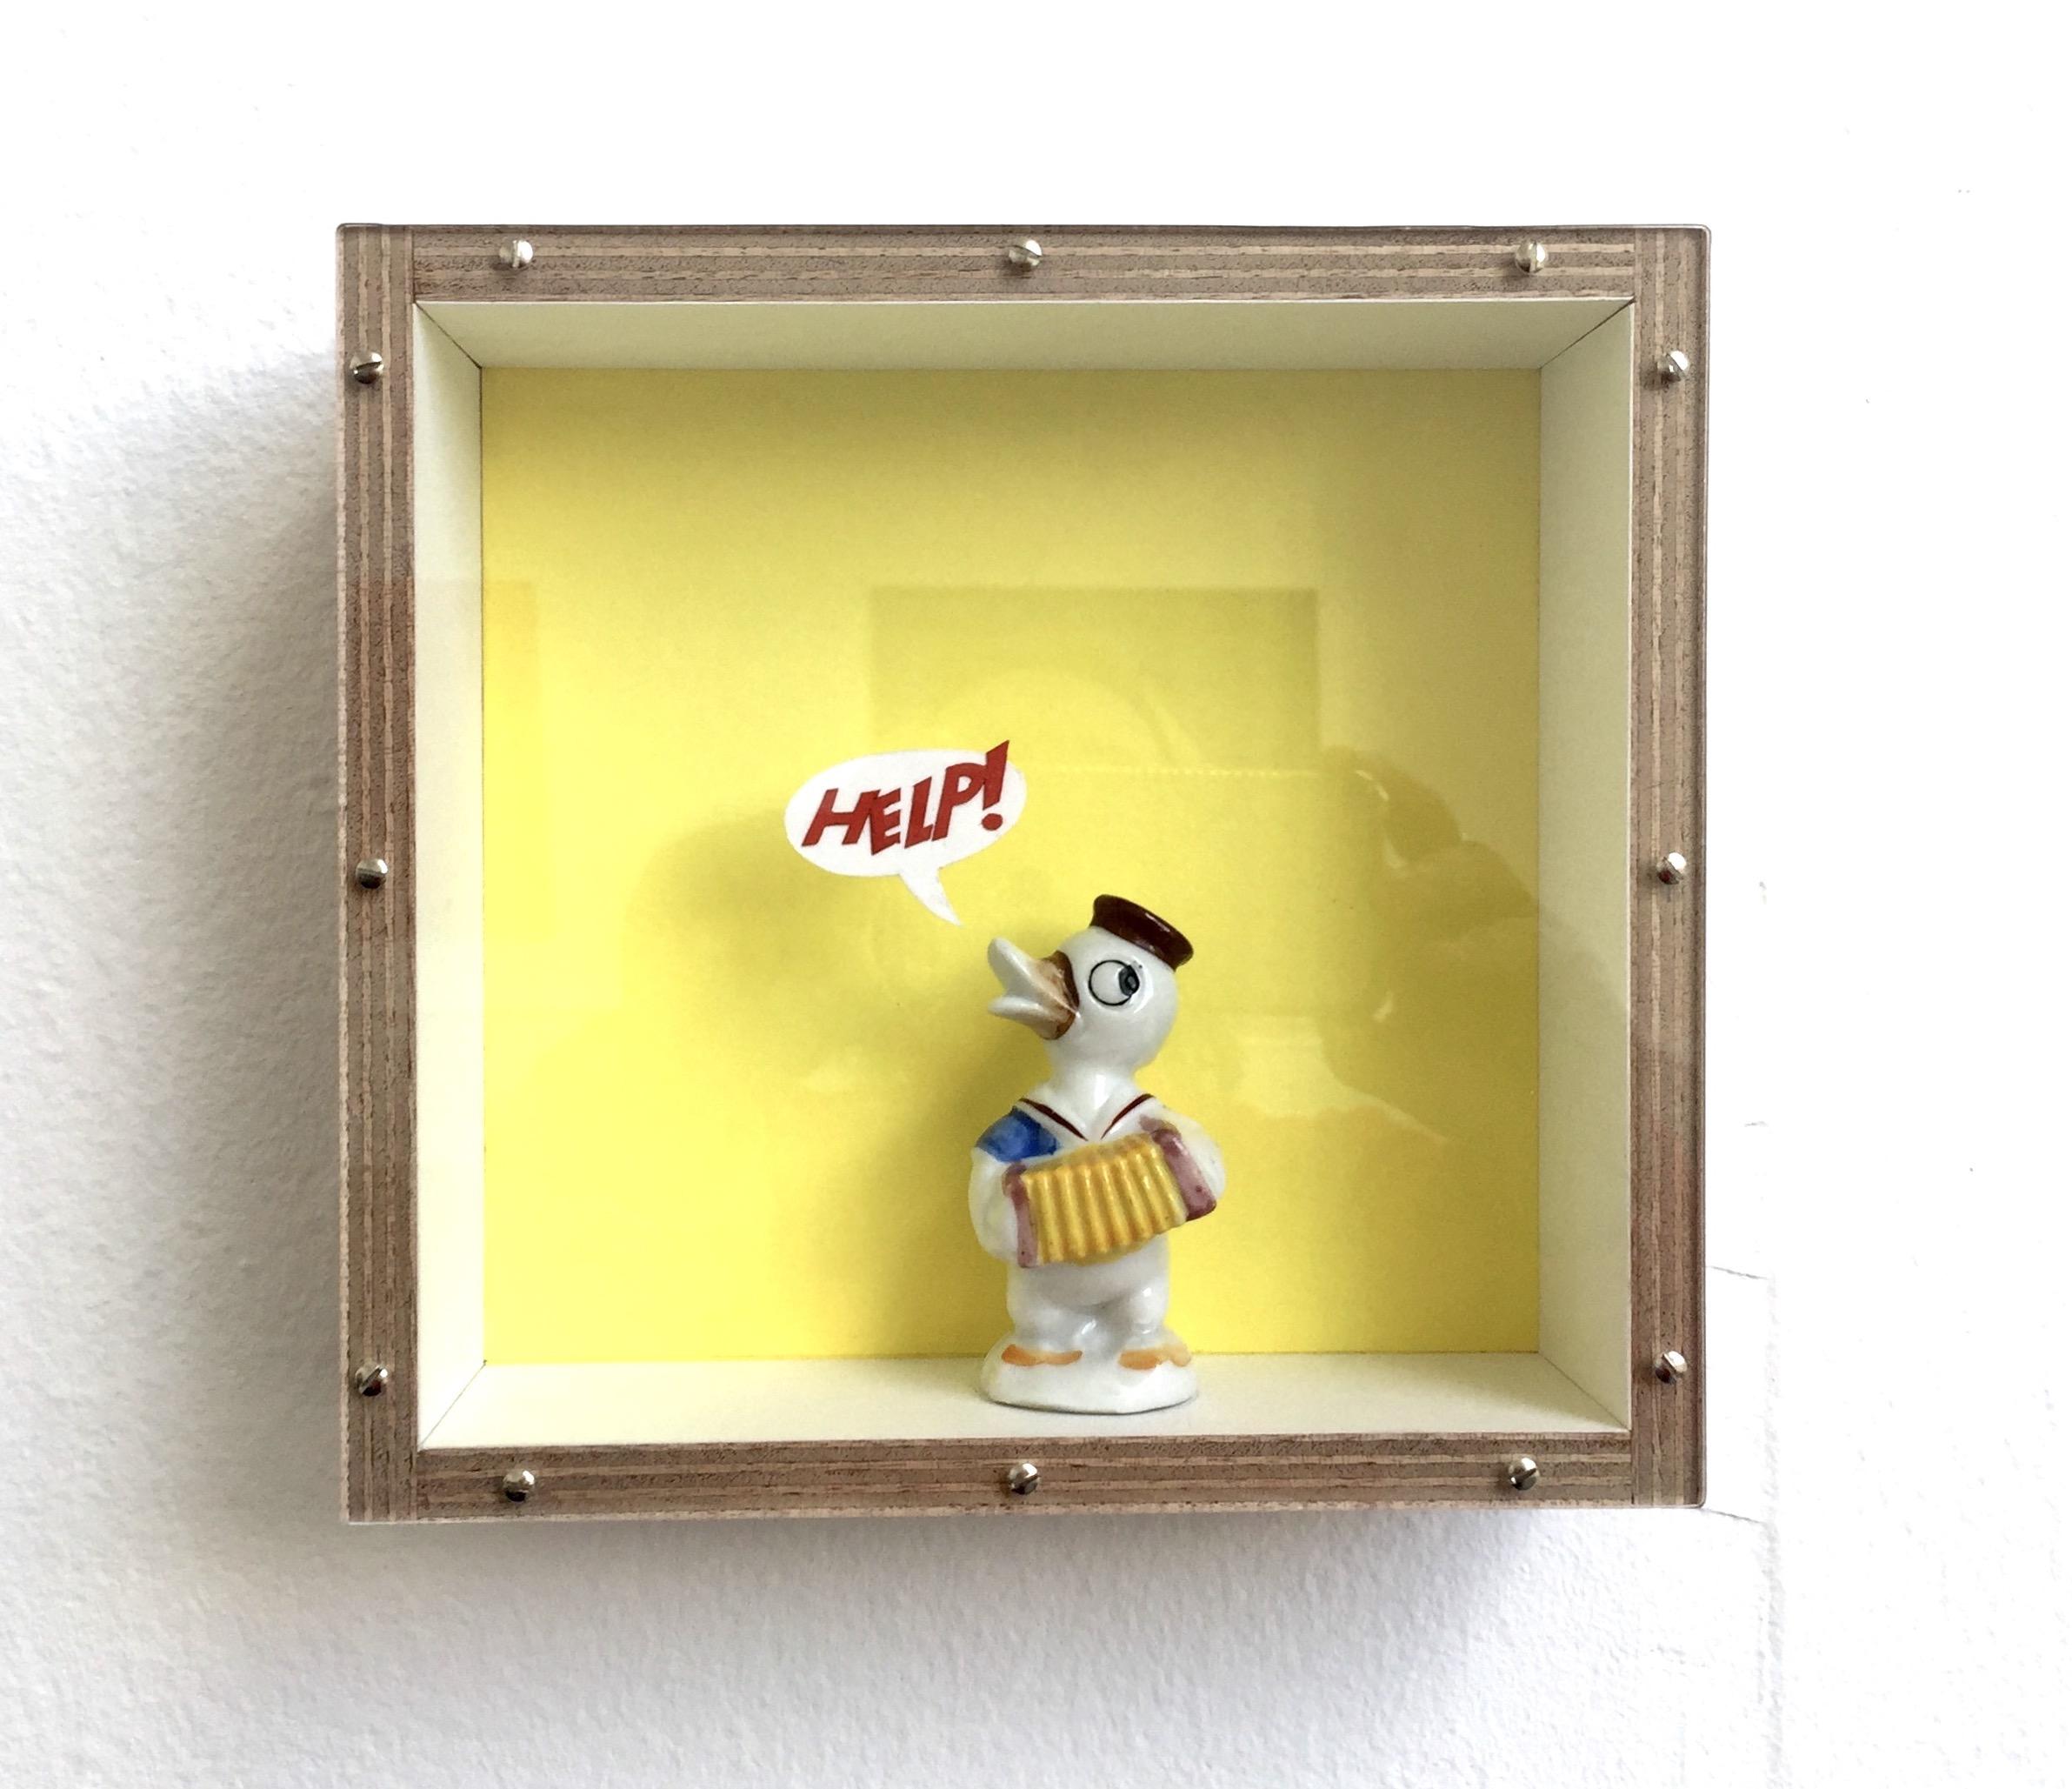 Ande och Materia / Mind and Matter, april 2020. Help!, 2019 Porslin, papper, trä, plexiglas, 18 x 19 x 8 cm